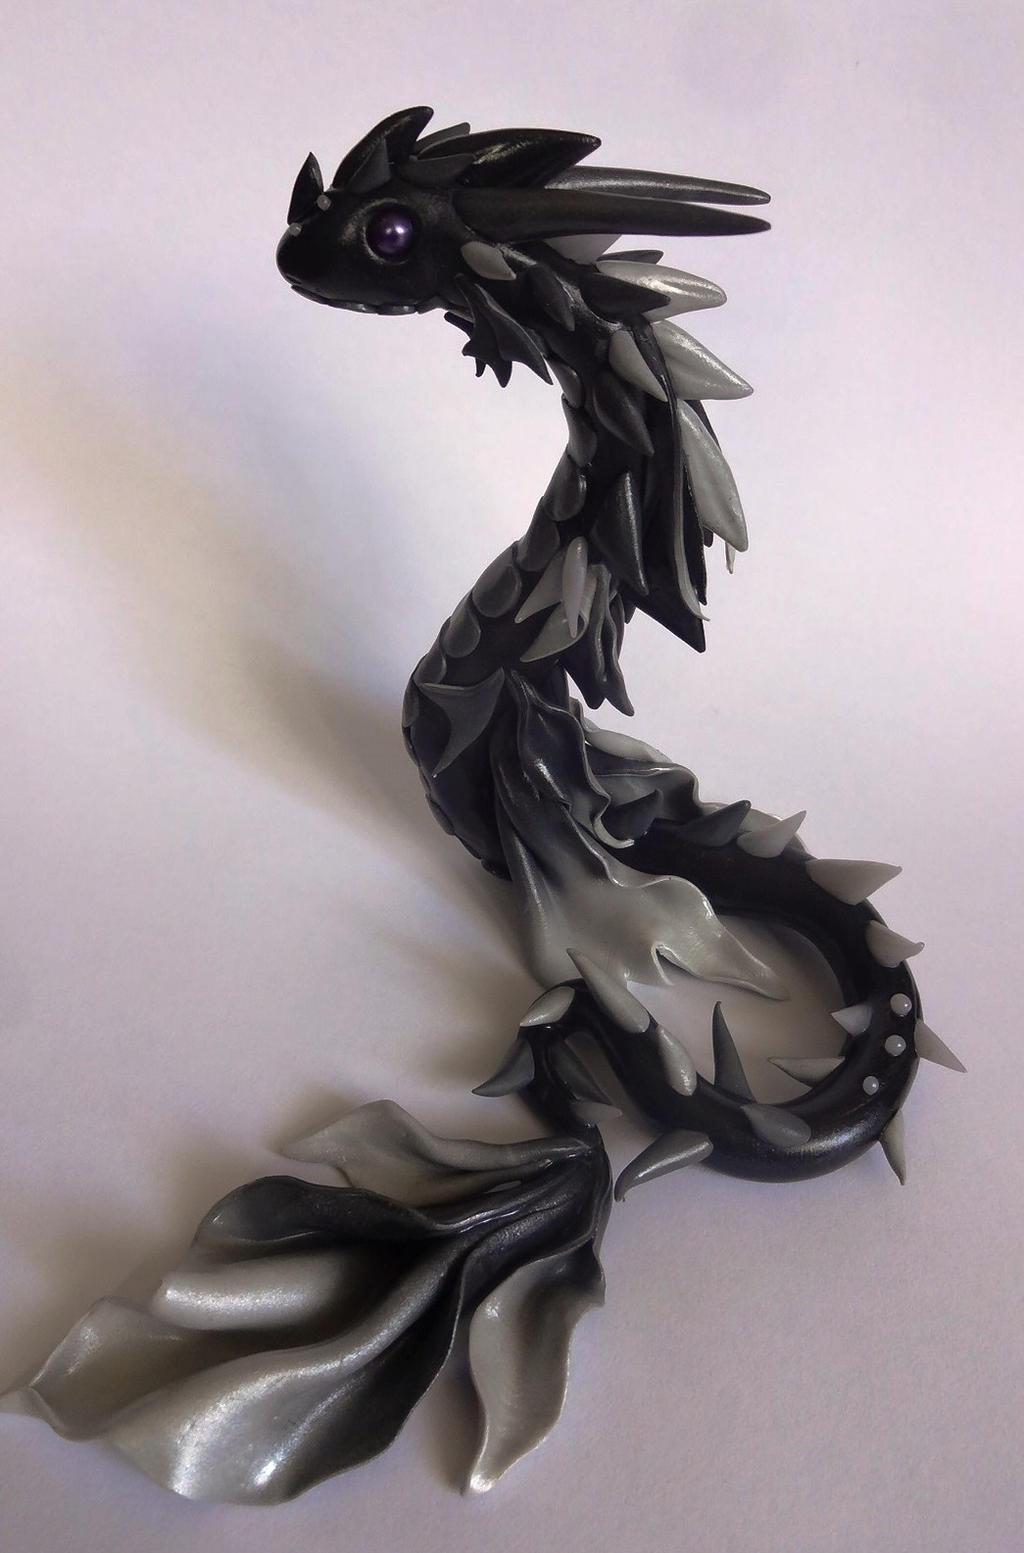 dragon noir et blanc by krisclay74 on deviantart. Black Bedroom Furniture Sets. Home Design Ideas